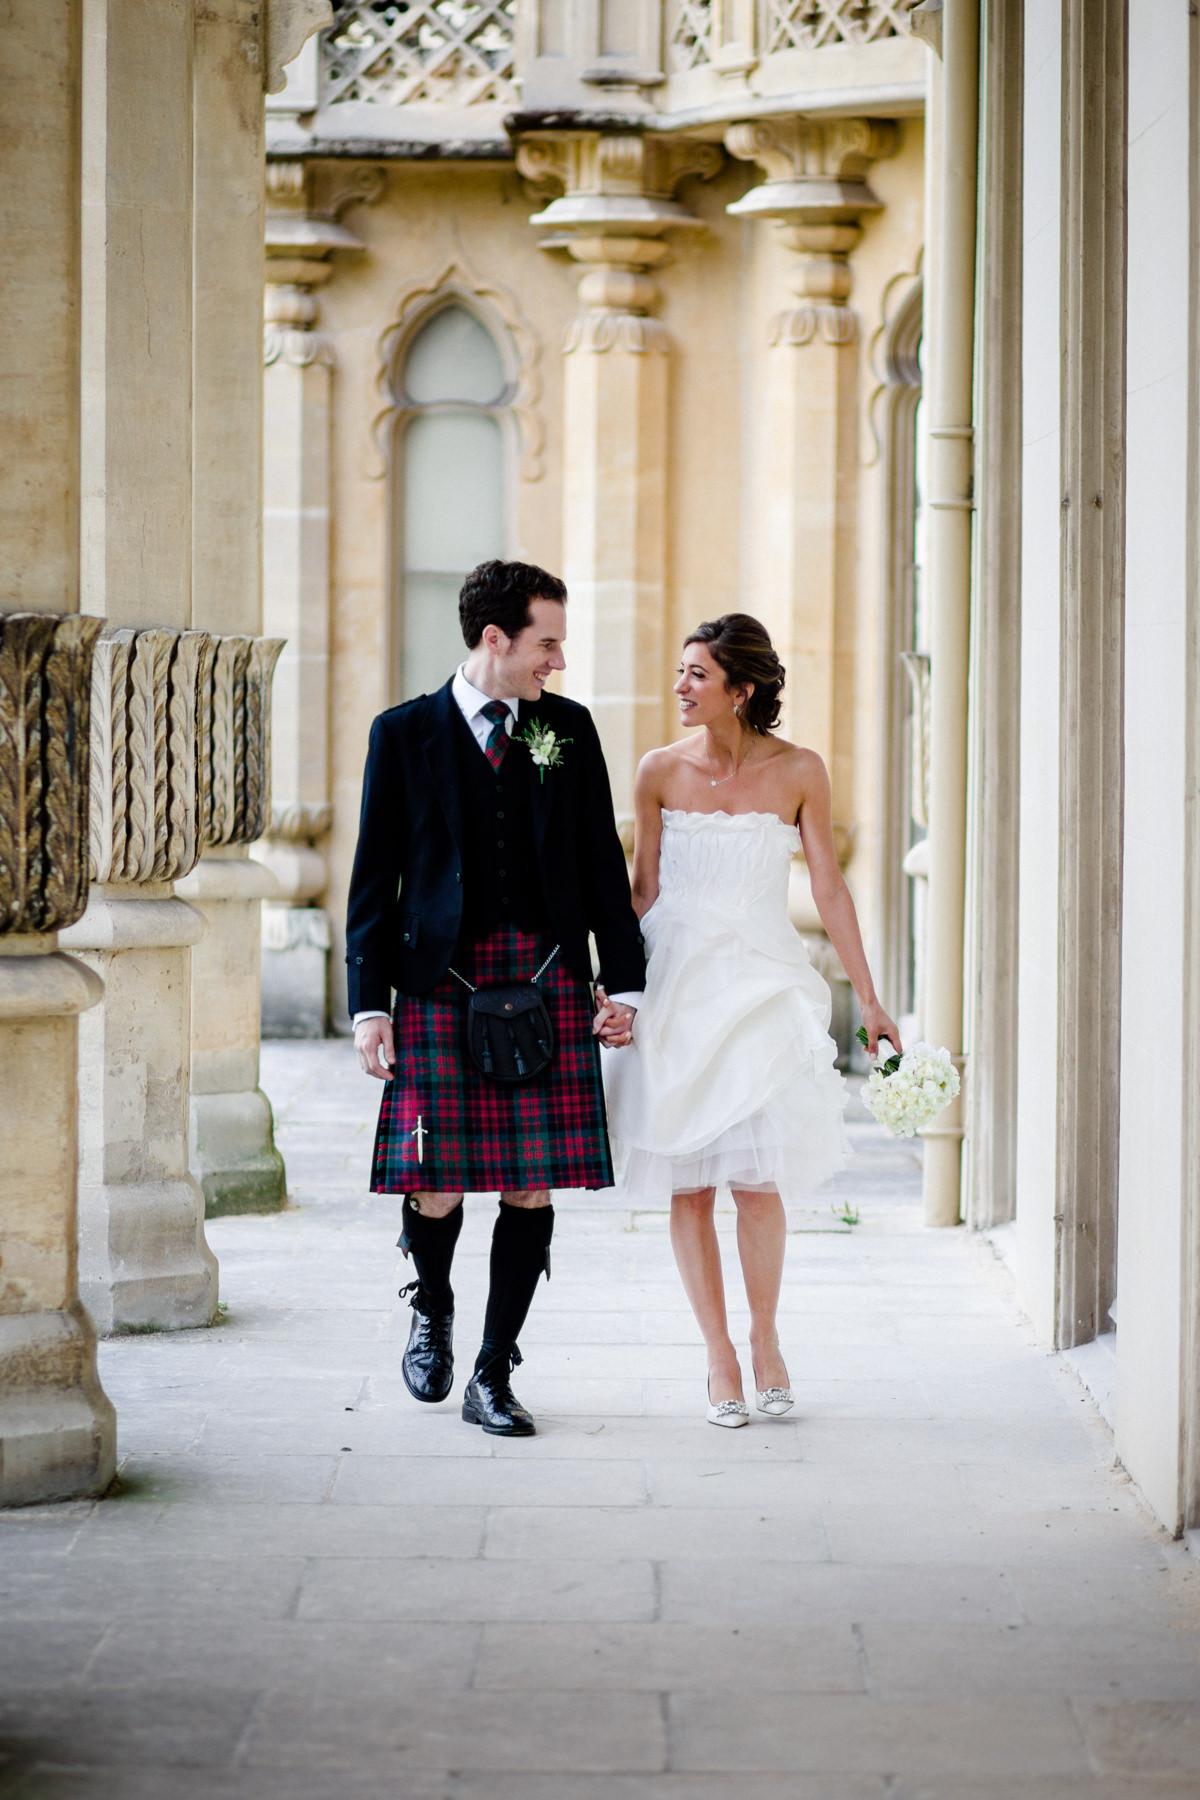 Royal Pavilion wedding Brighton CN Michael Stanton Photography 16